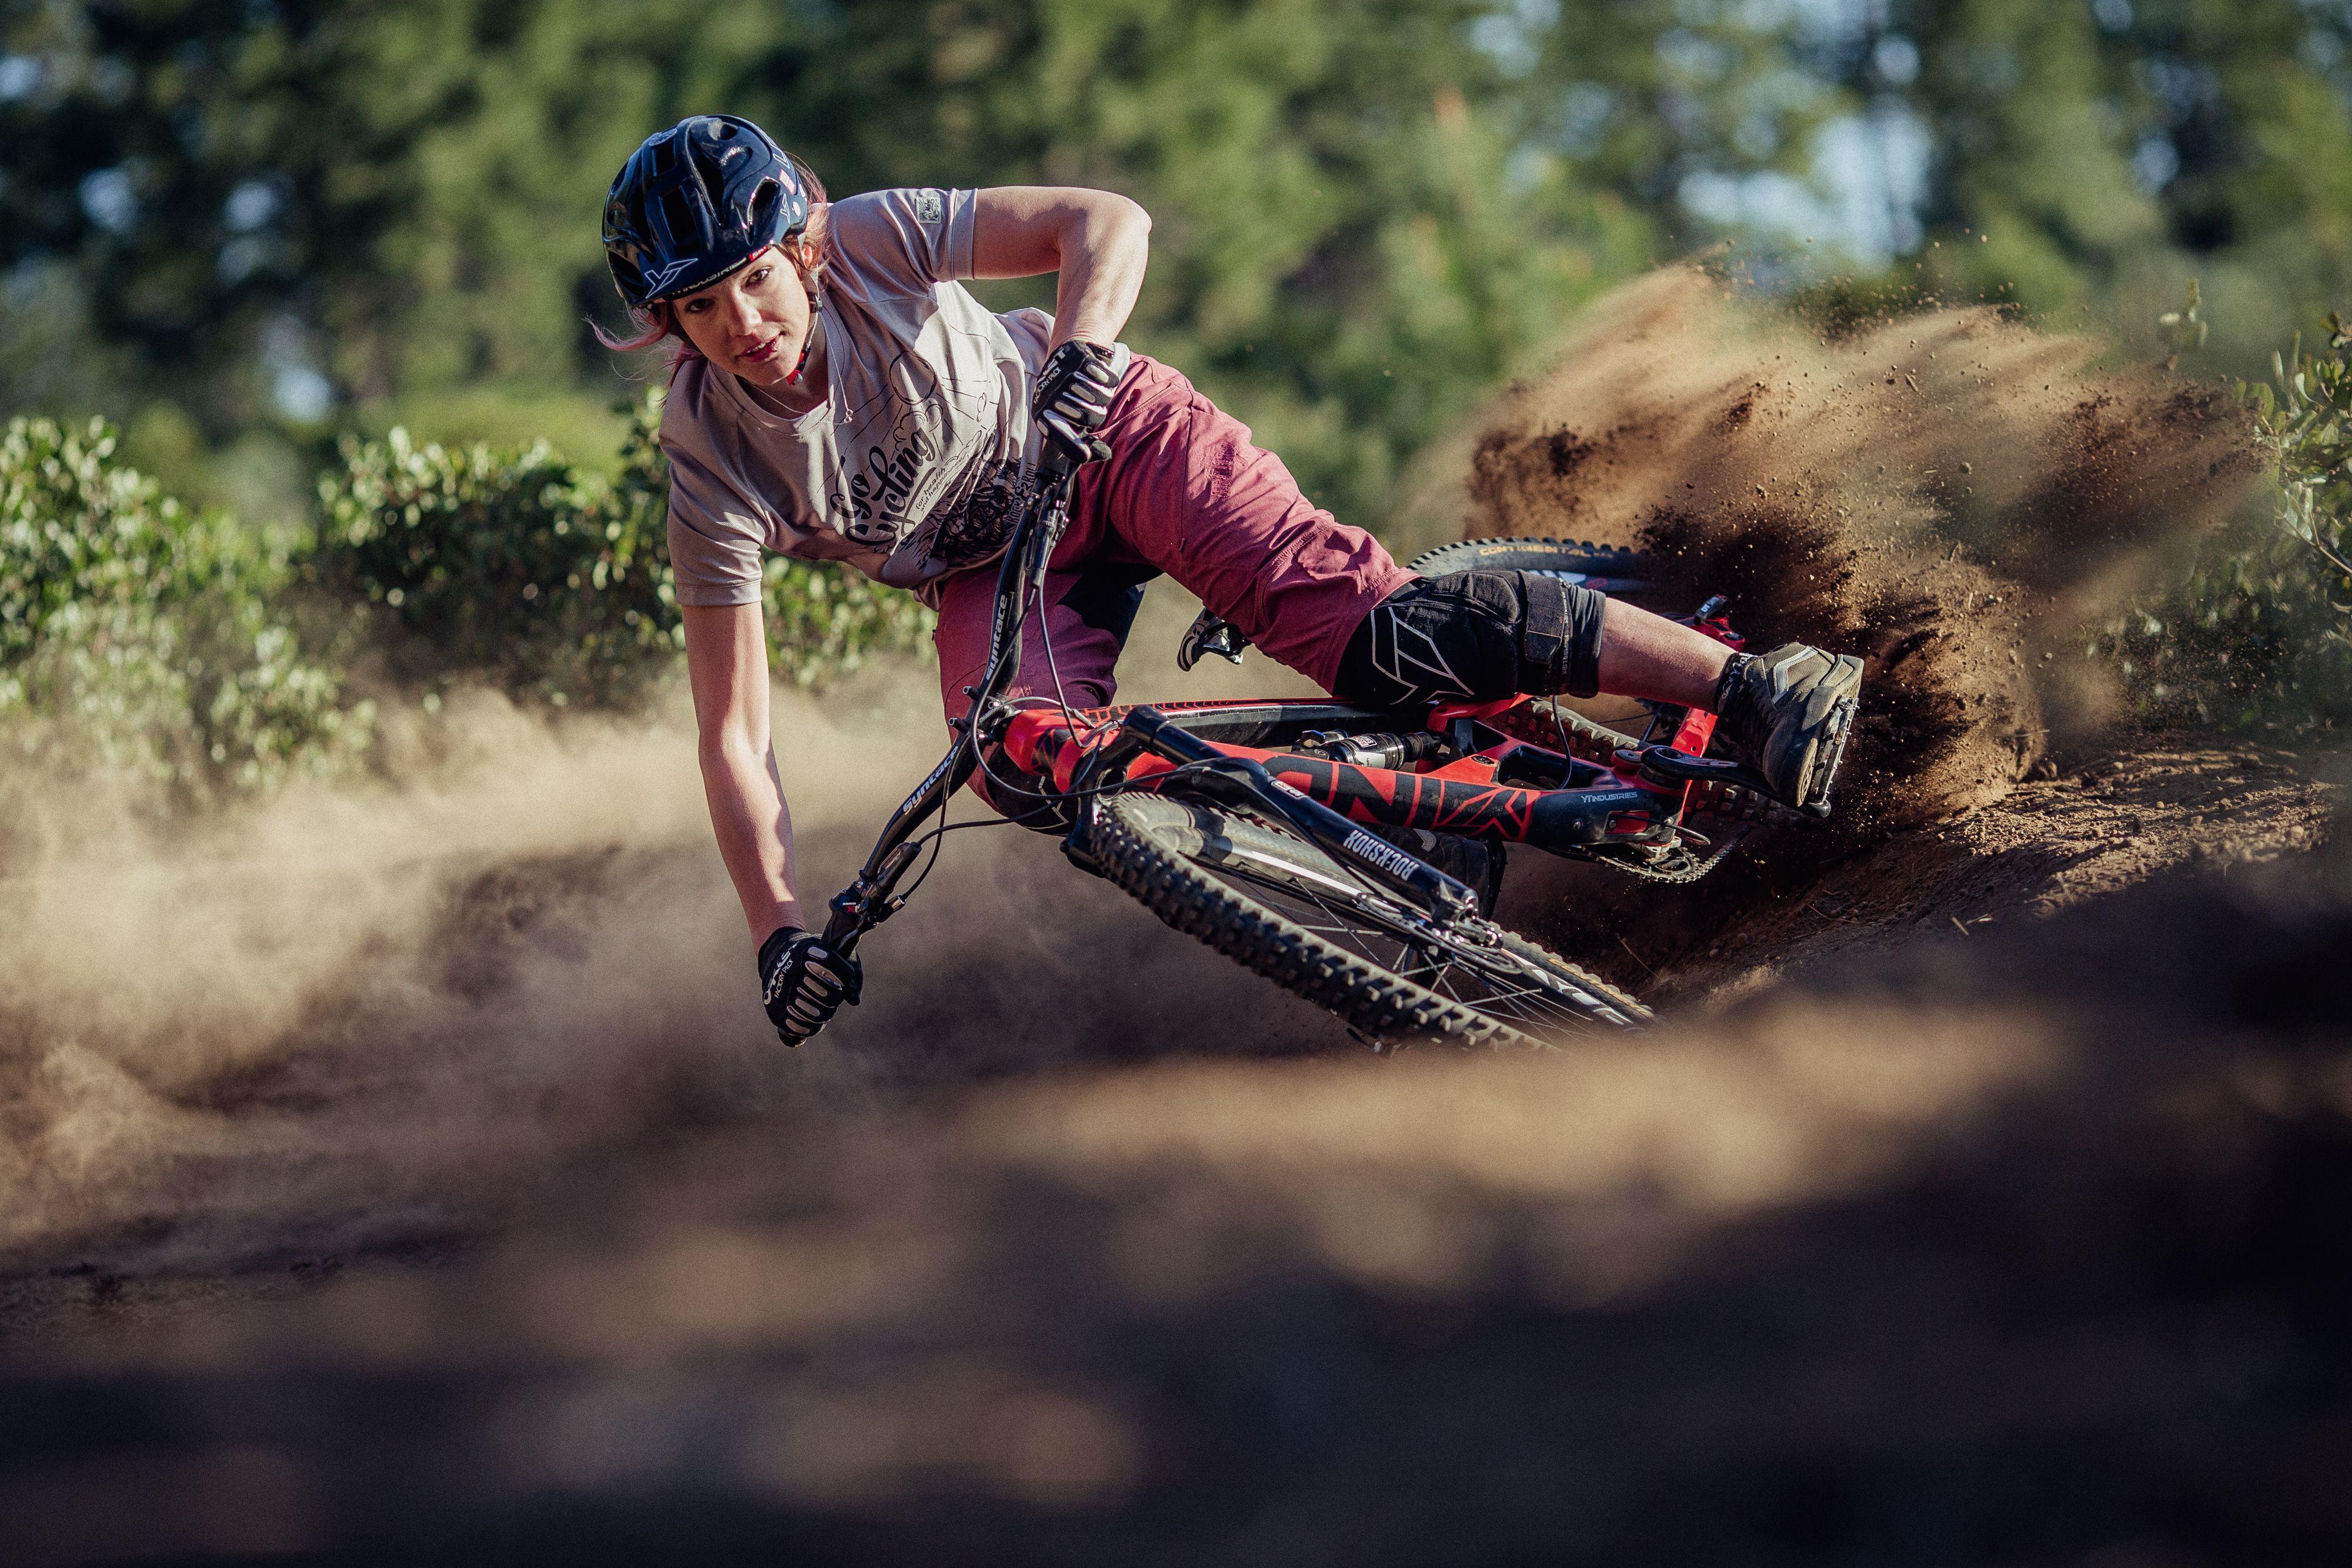 Mtb Freeride Women All Styles For Singletrails And Bikeparks